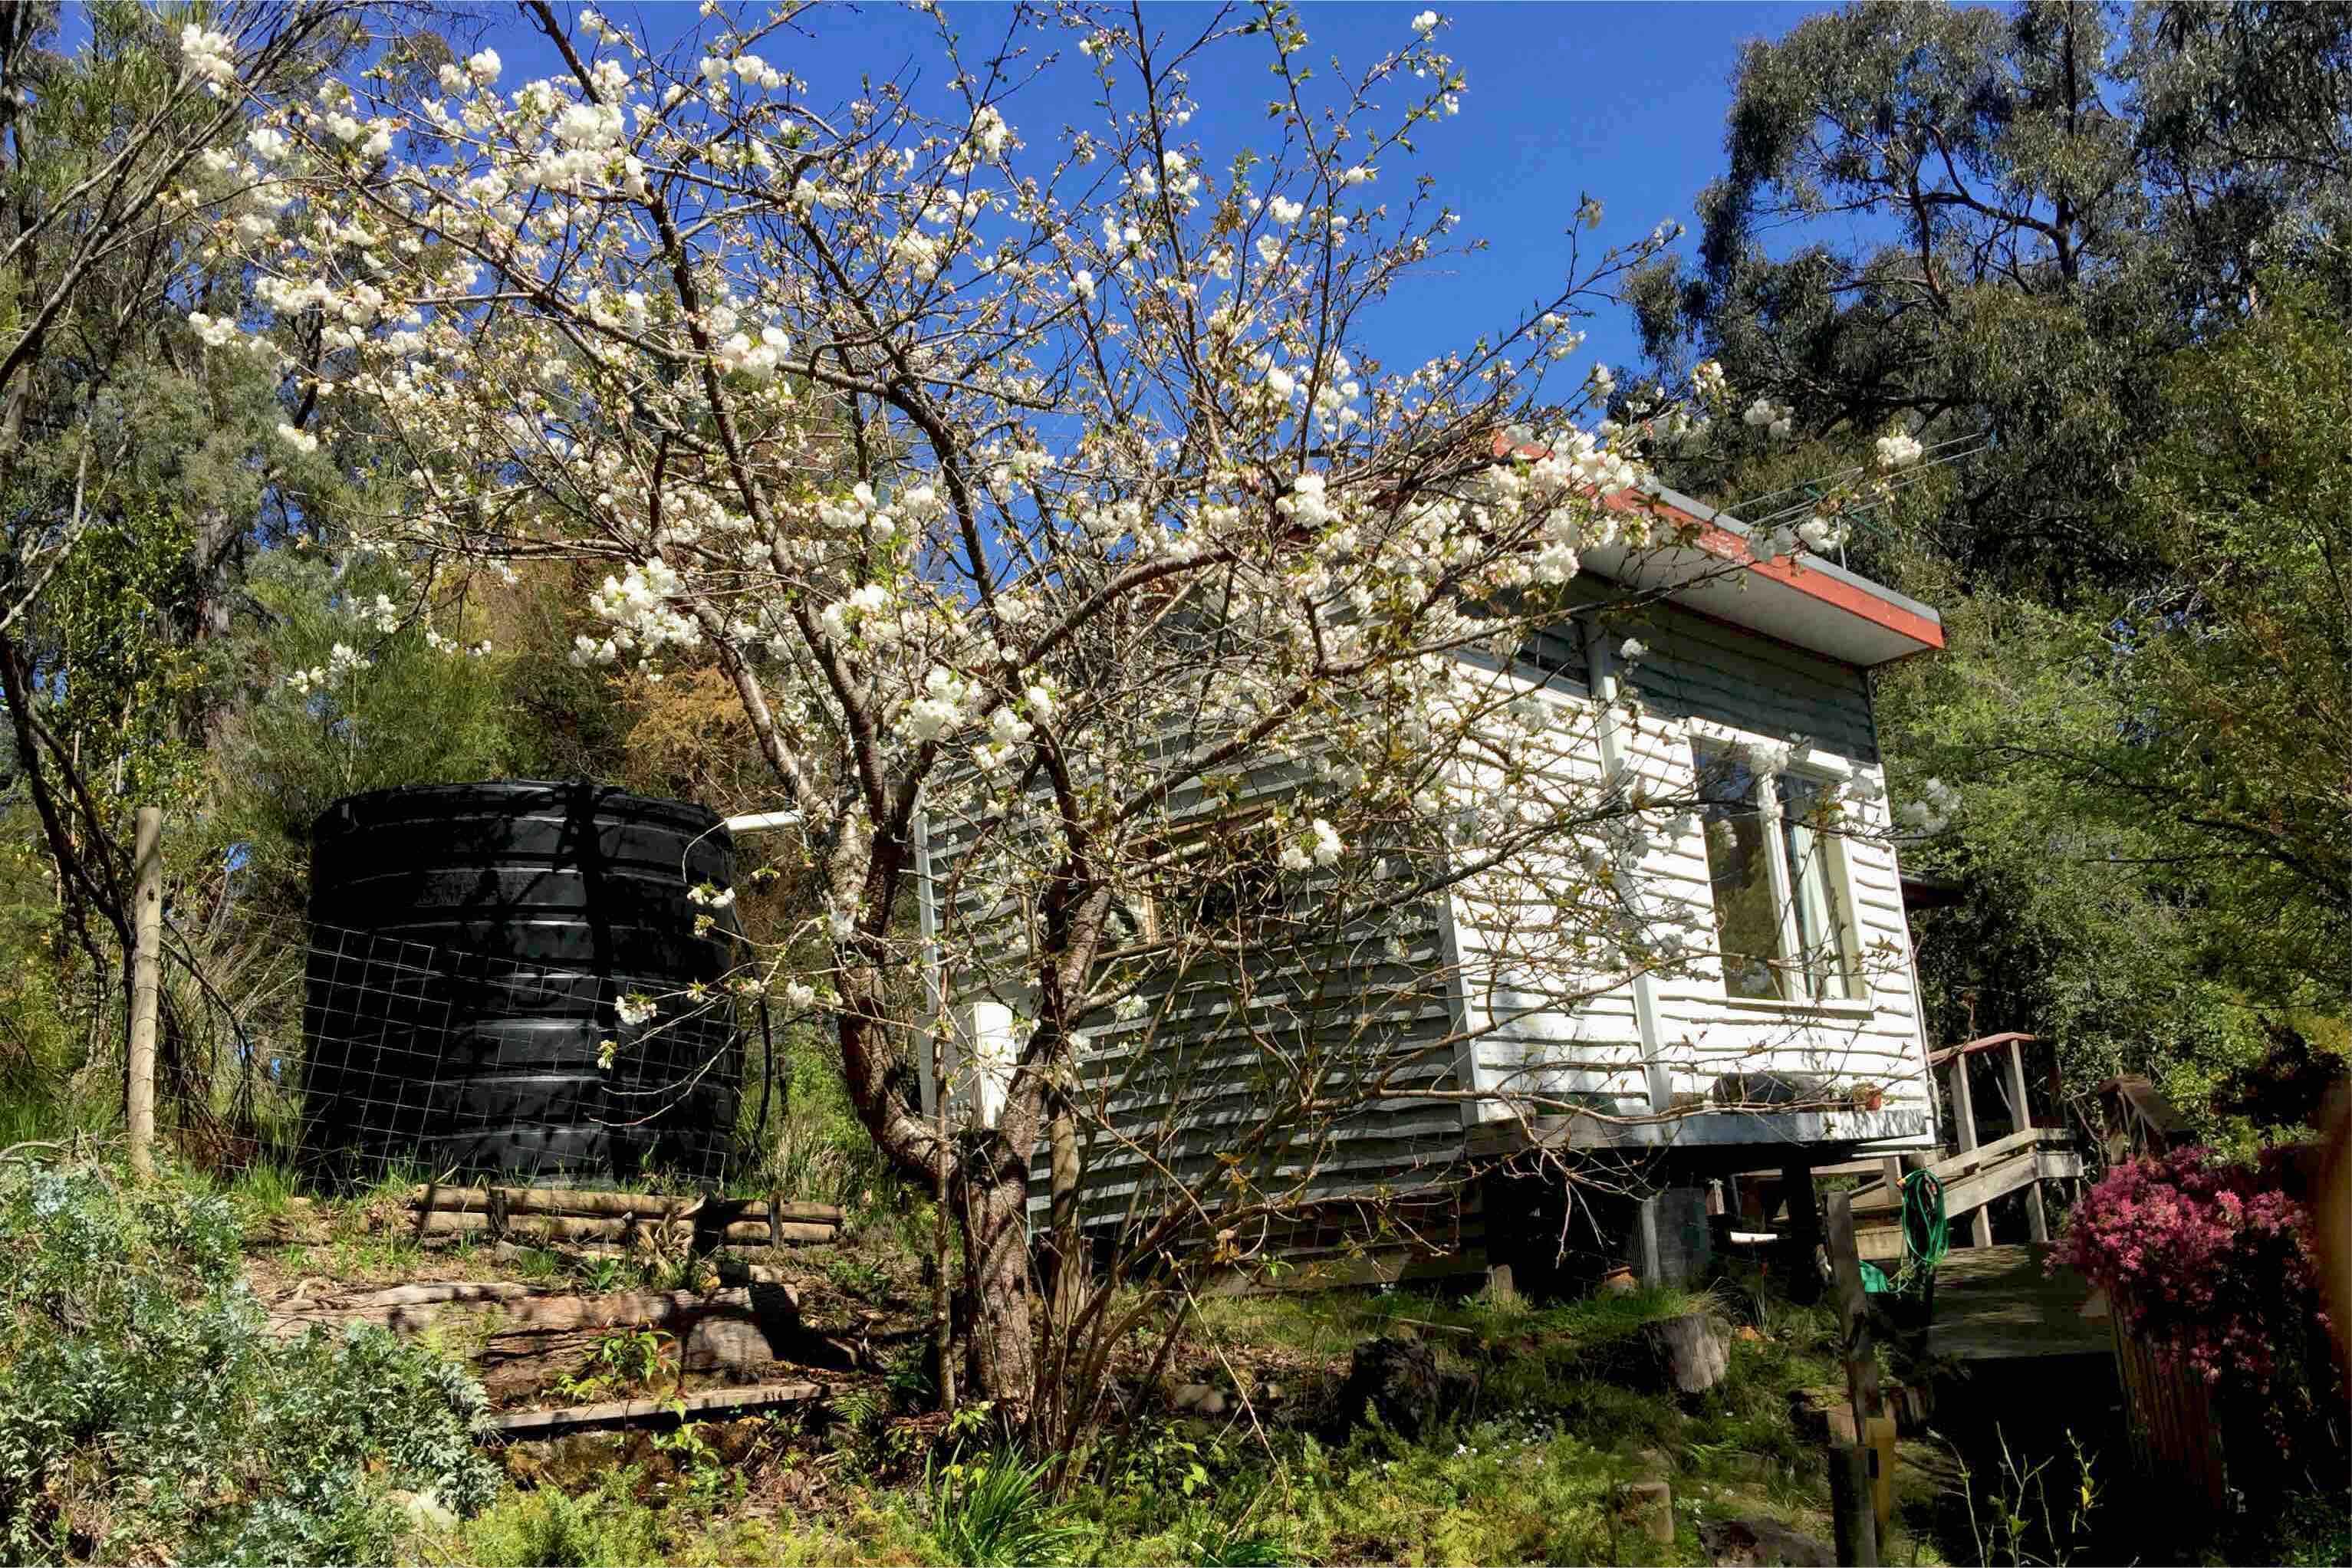 Redwood Tiny Home, Warburton/ Yarra Valley Retreat - Tiny houses